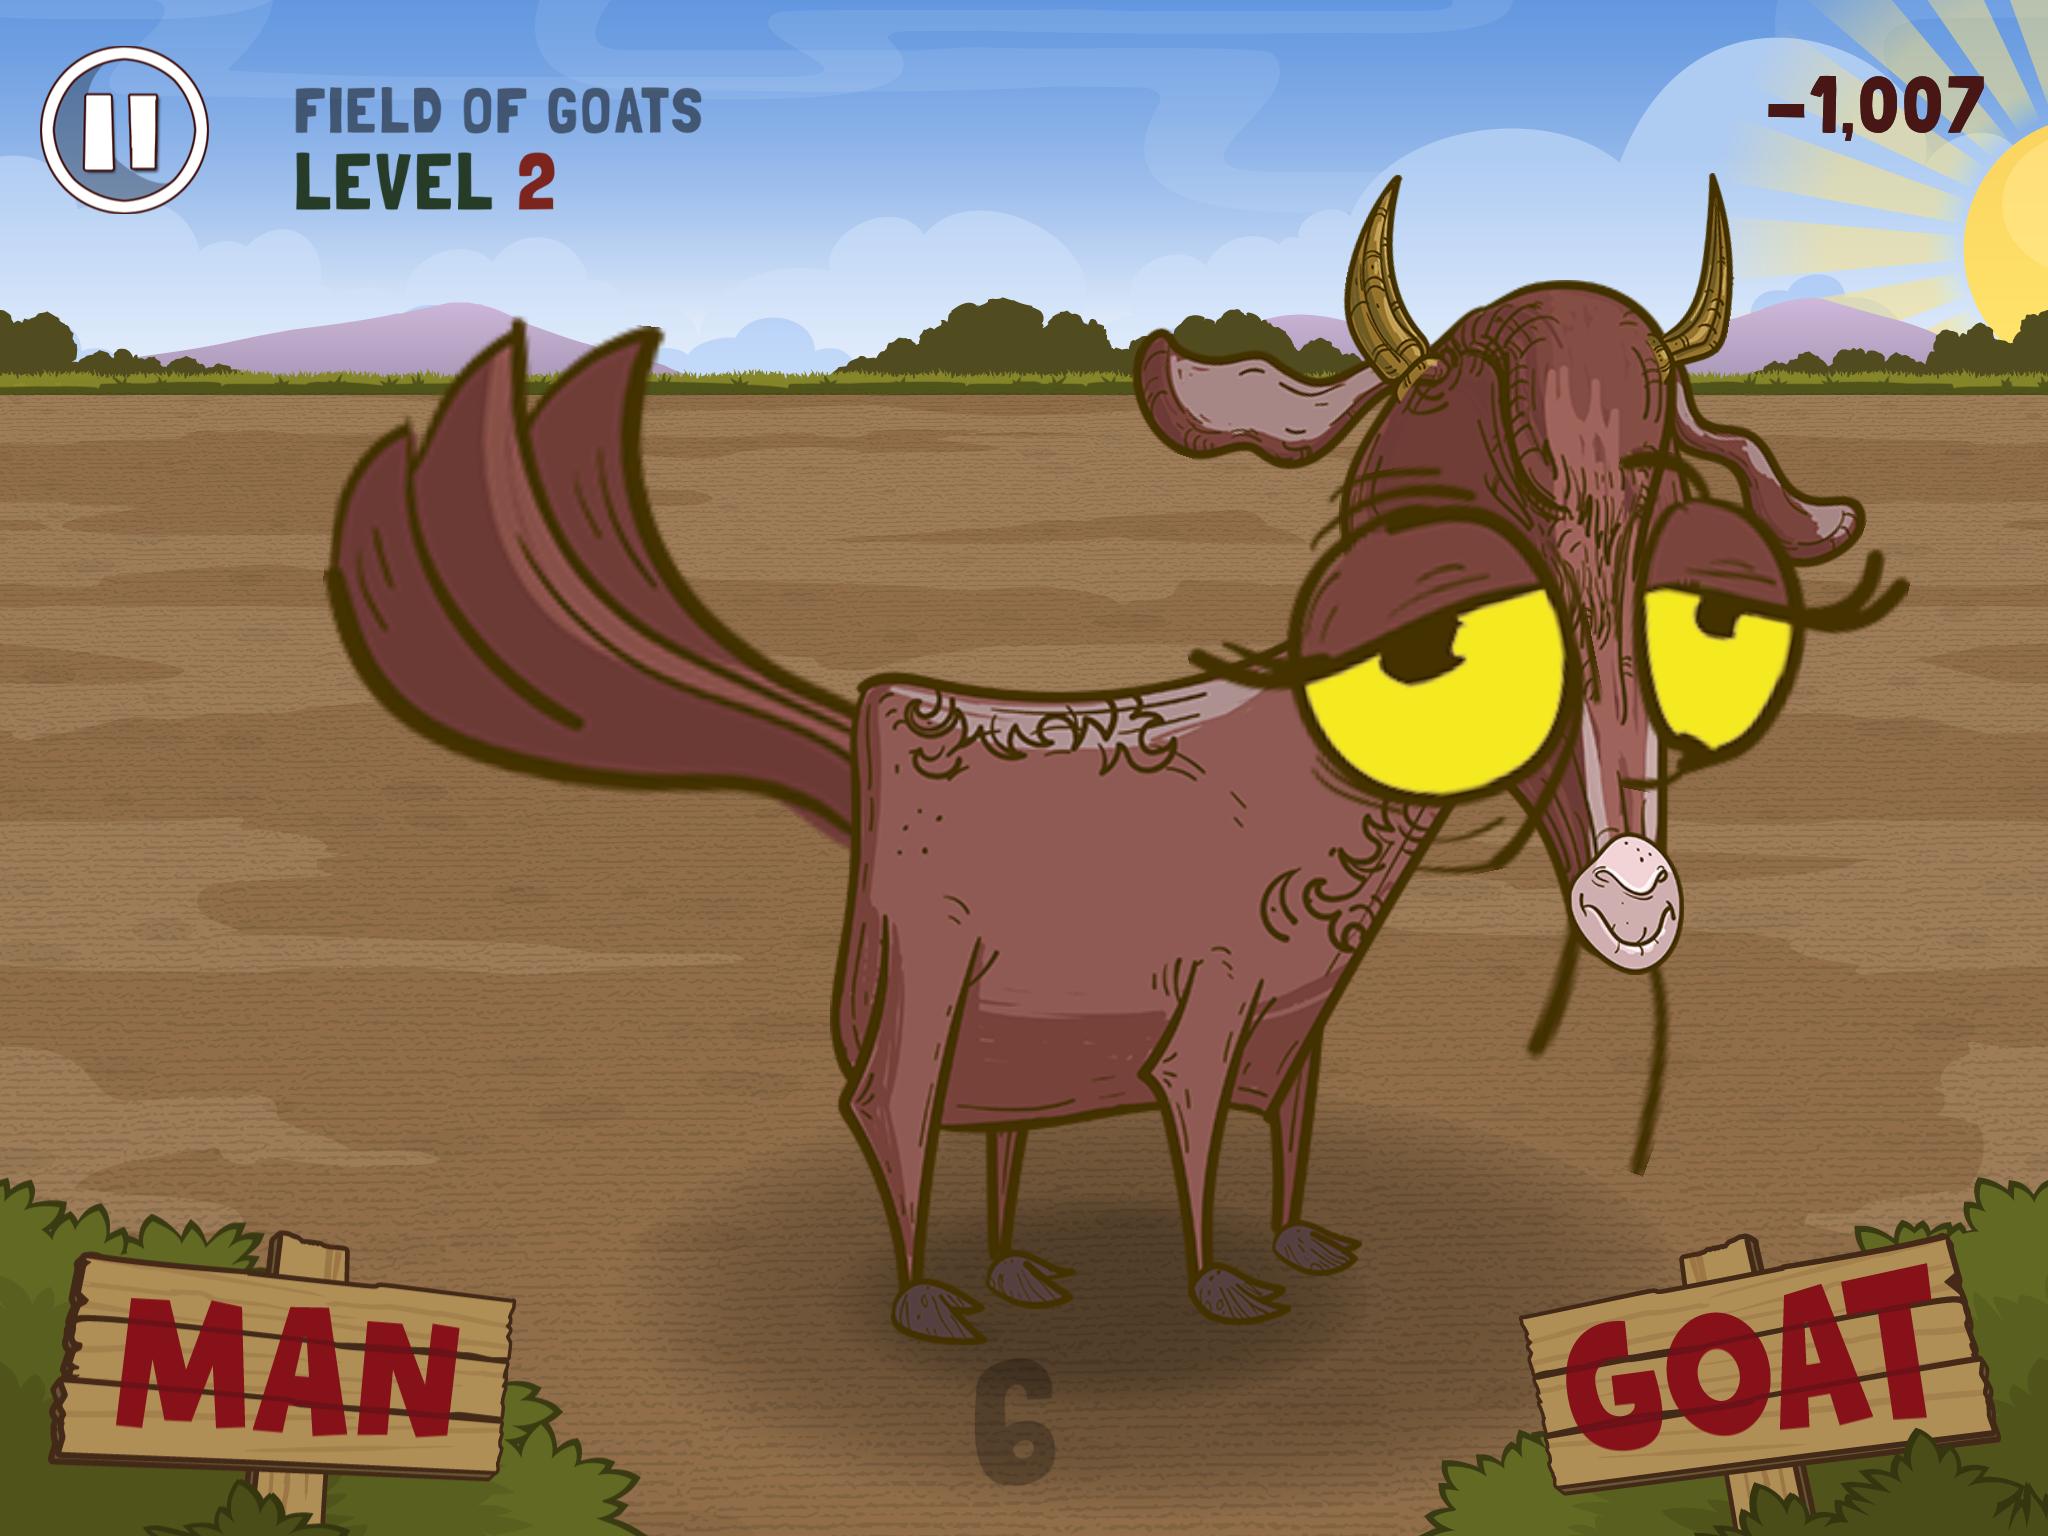 Man or Goat iPhone,iPad, screenshot 1